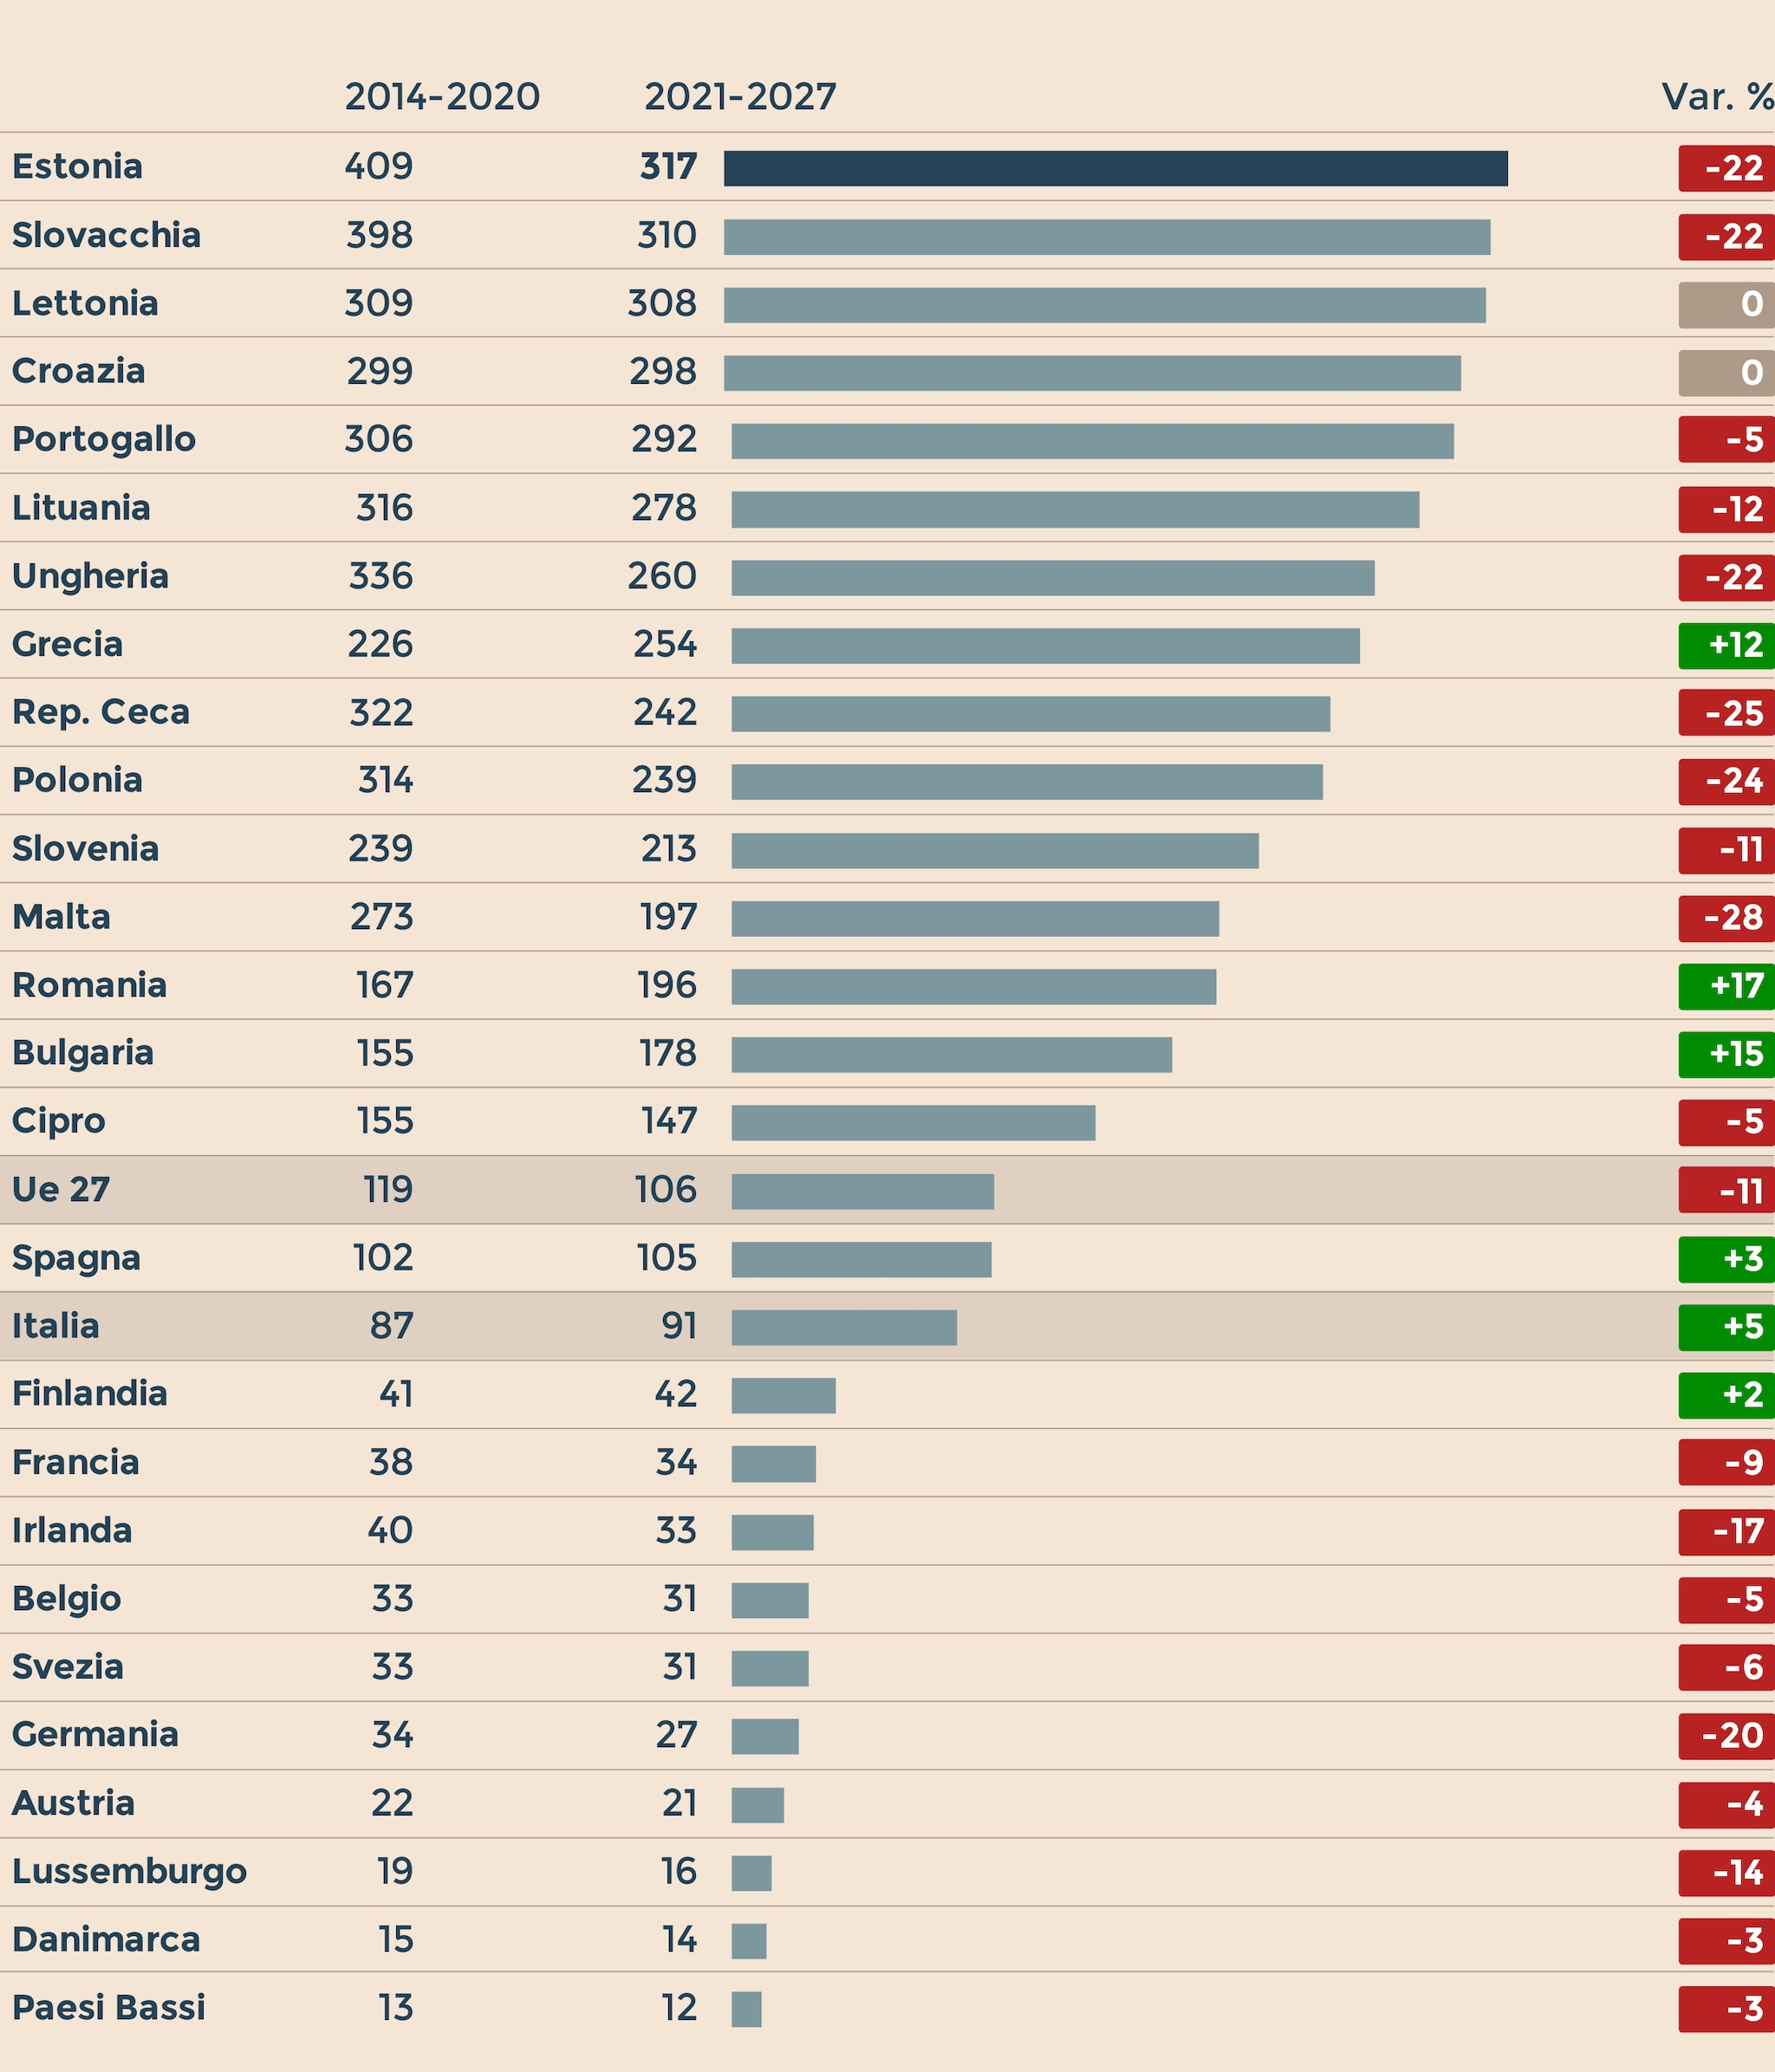 FONDI STRUTTURALI EUROPEI: INTENSITÀDEGLI AIUTI